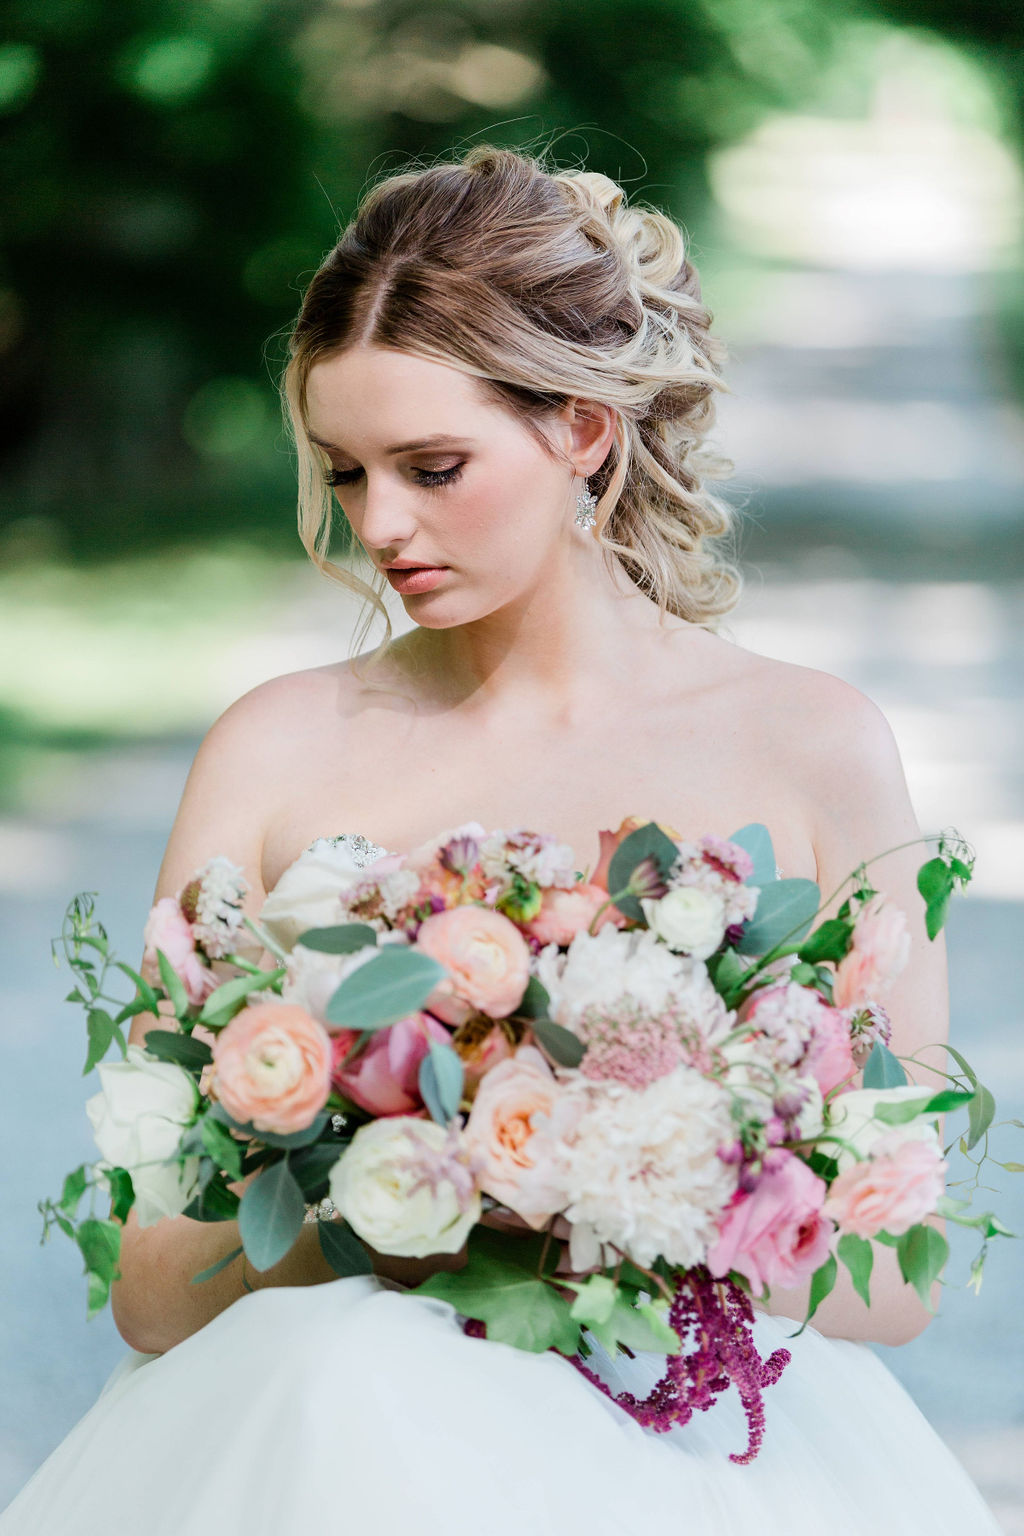 Kurtz-Orchards-Niagara-on-the-Lake-Styled-Wedding-Session-Shotlife-Studio-Calderone-Co-Luxury-Events-Vineyard-Bride-33.JPG